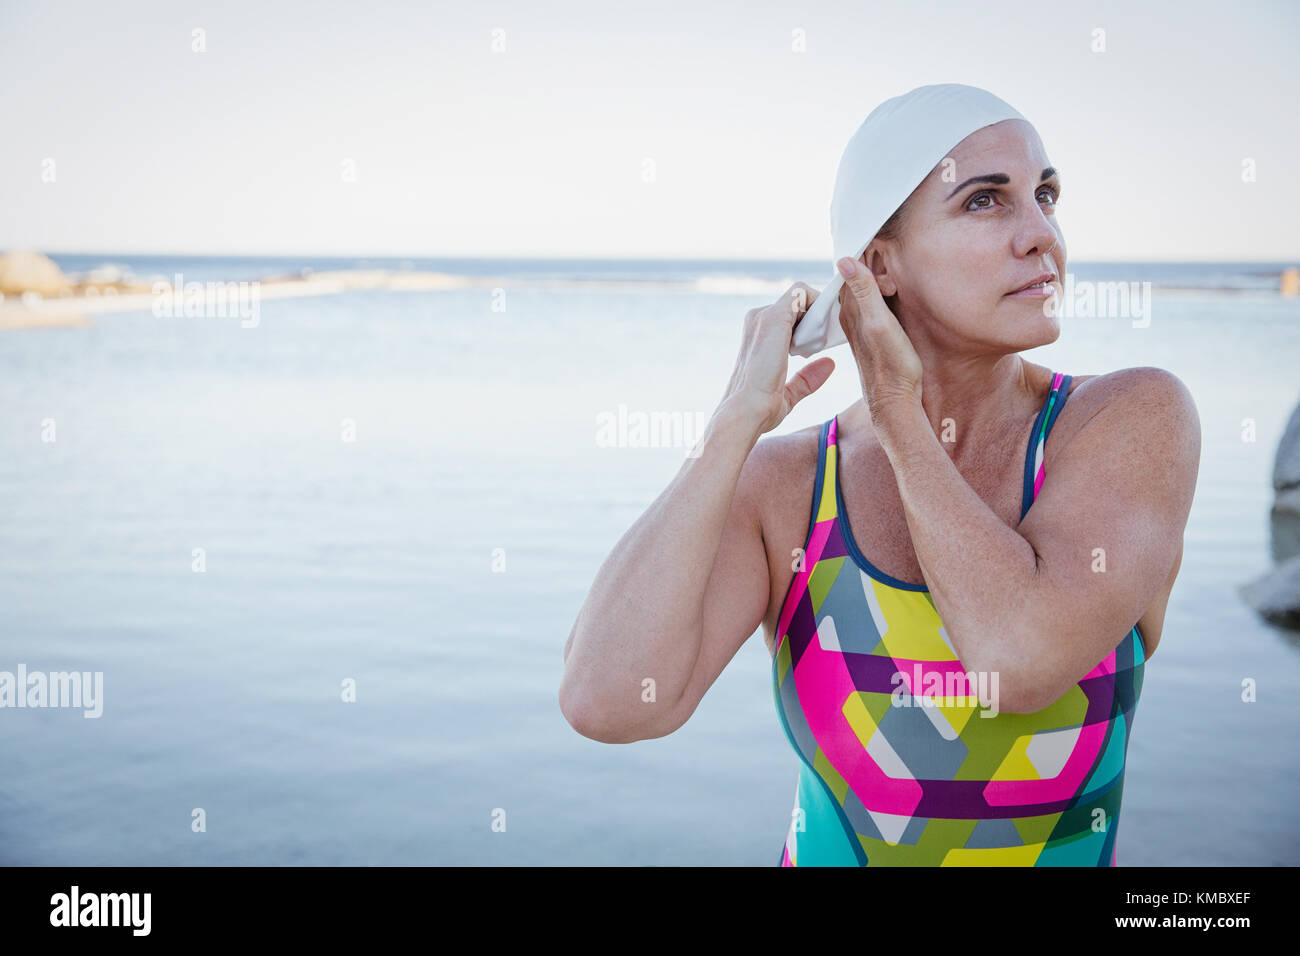 Female open water swimmer adjusting swimming cap at ocean - Stock Image